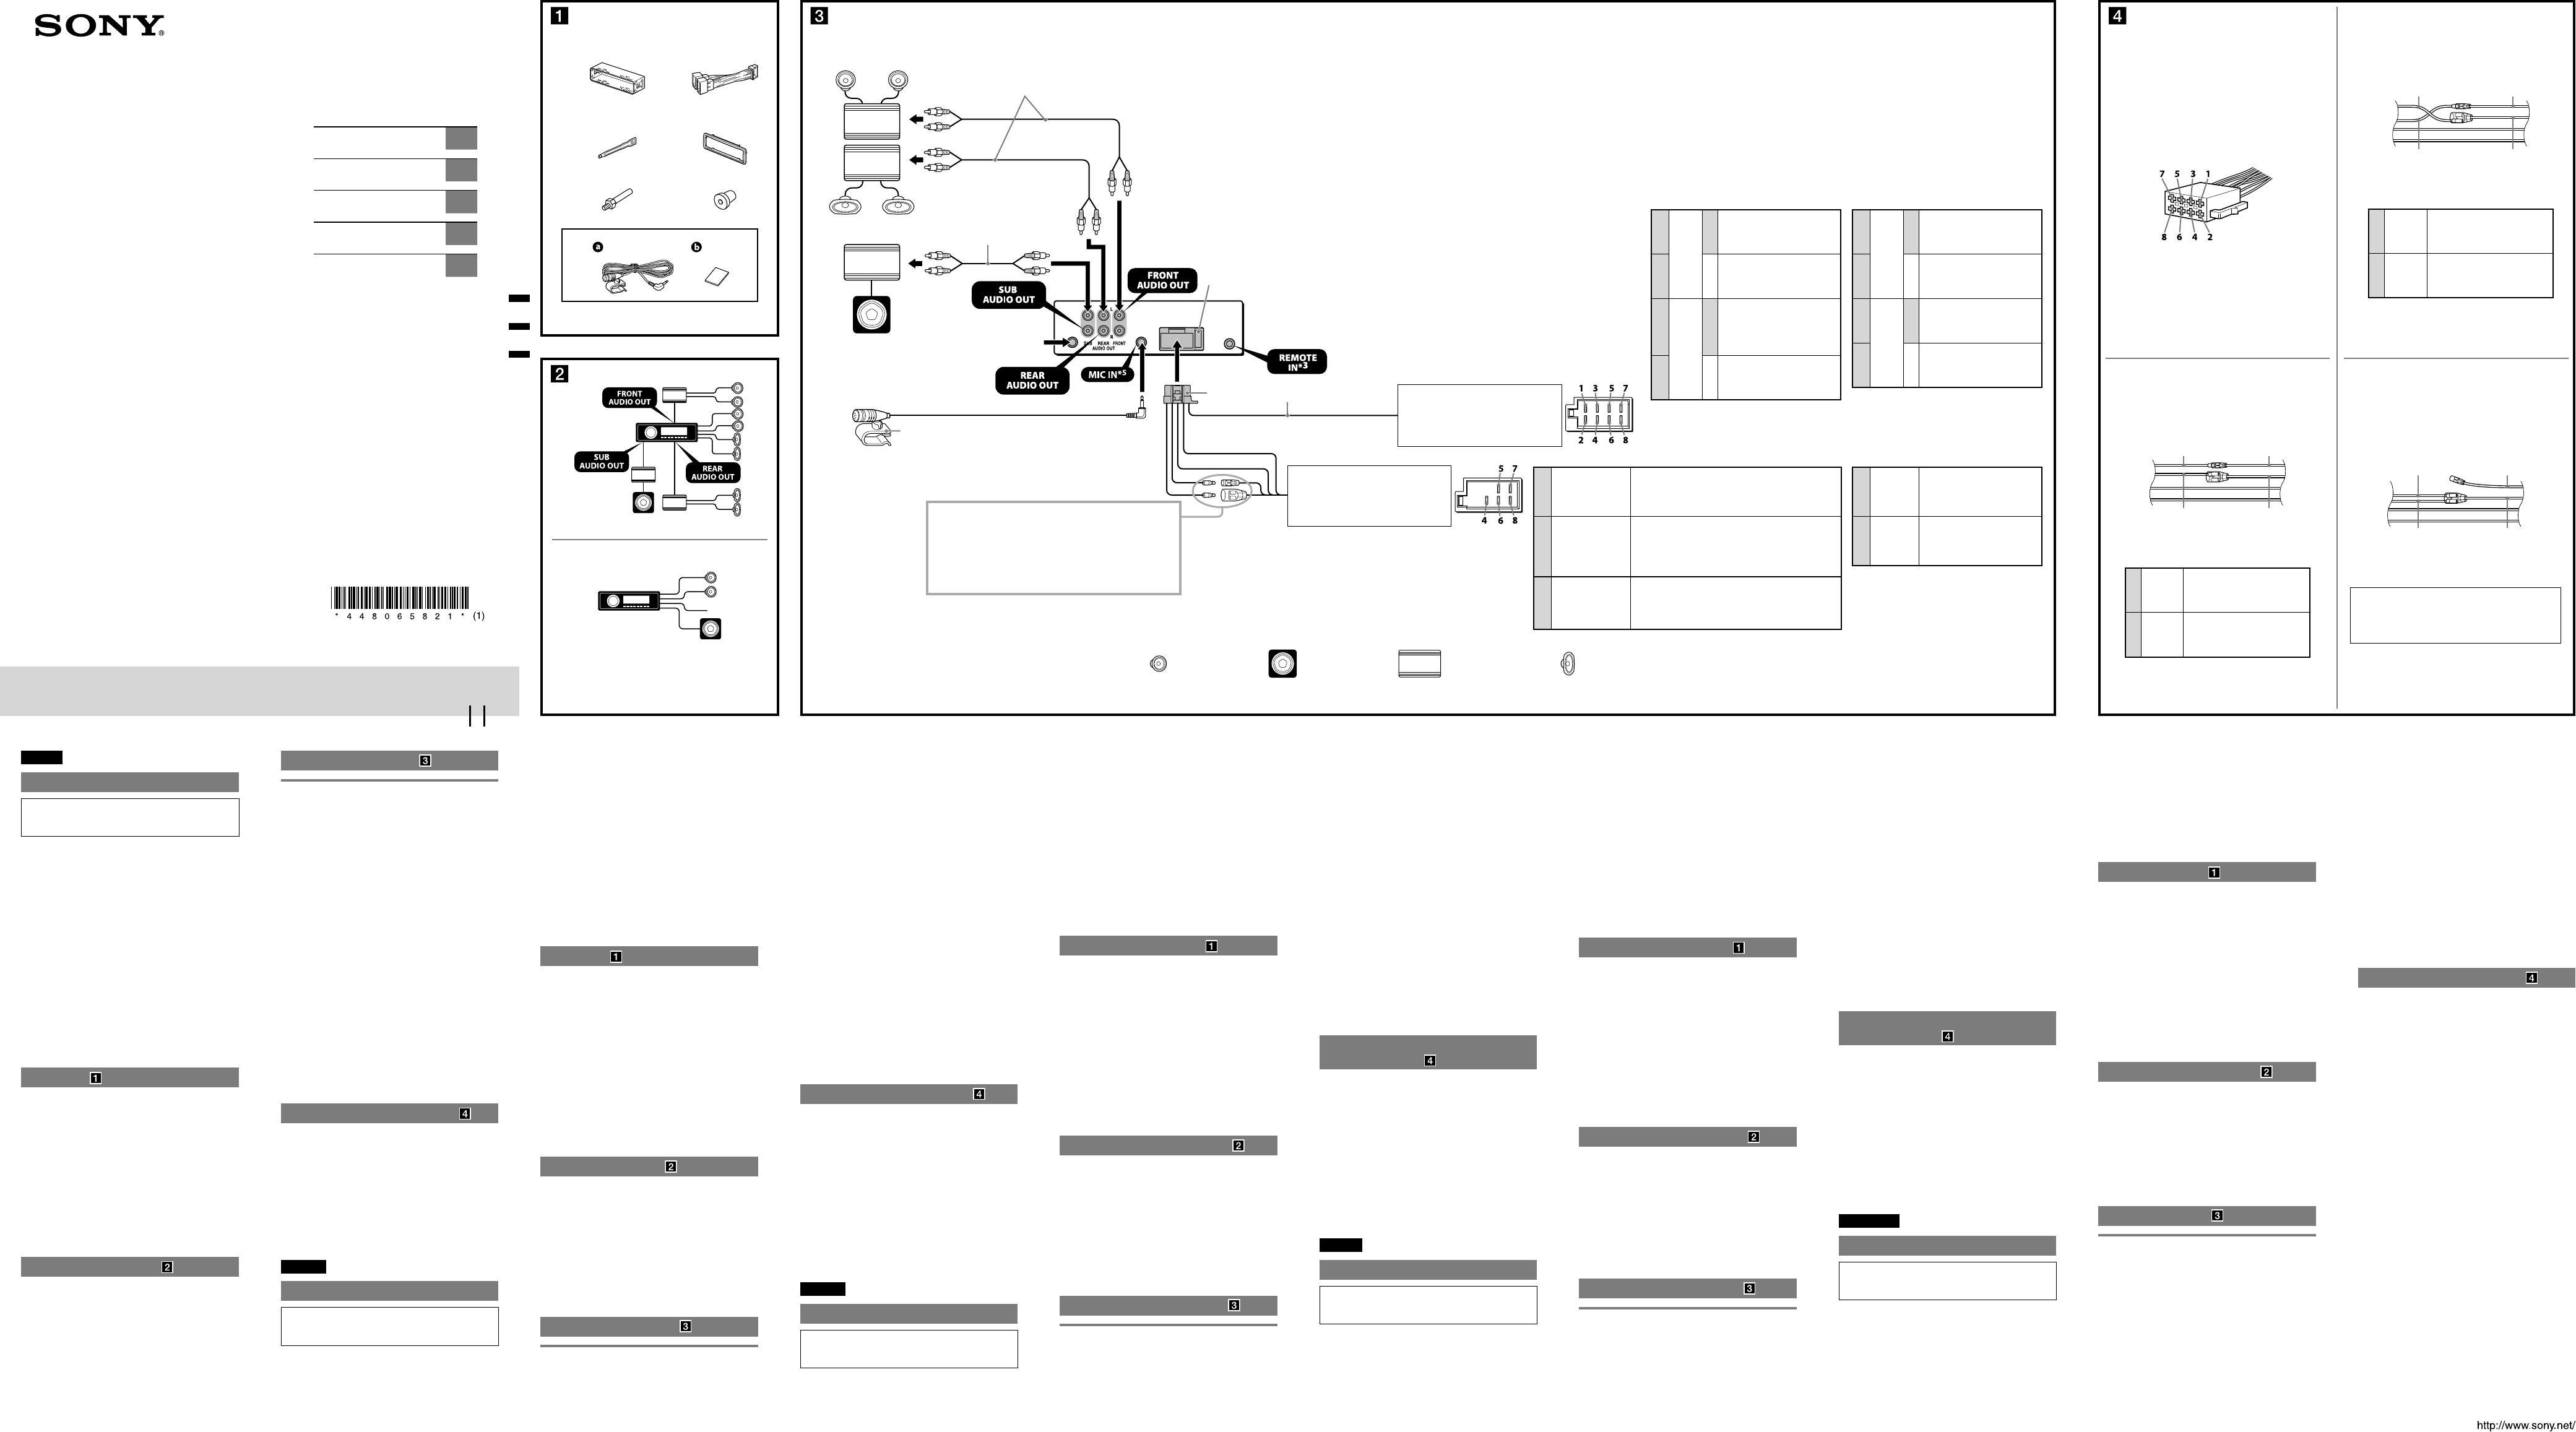 mex n5000bt wiring diagram